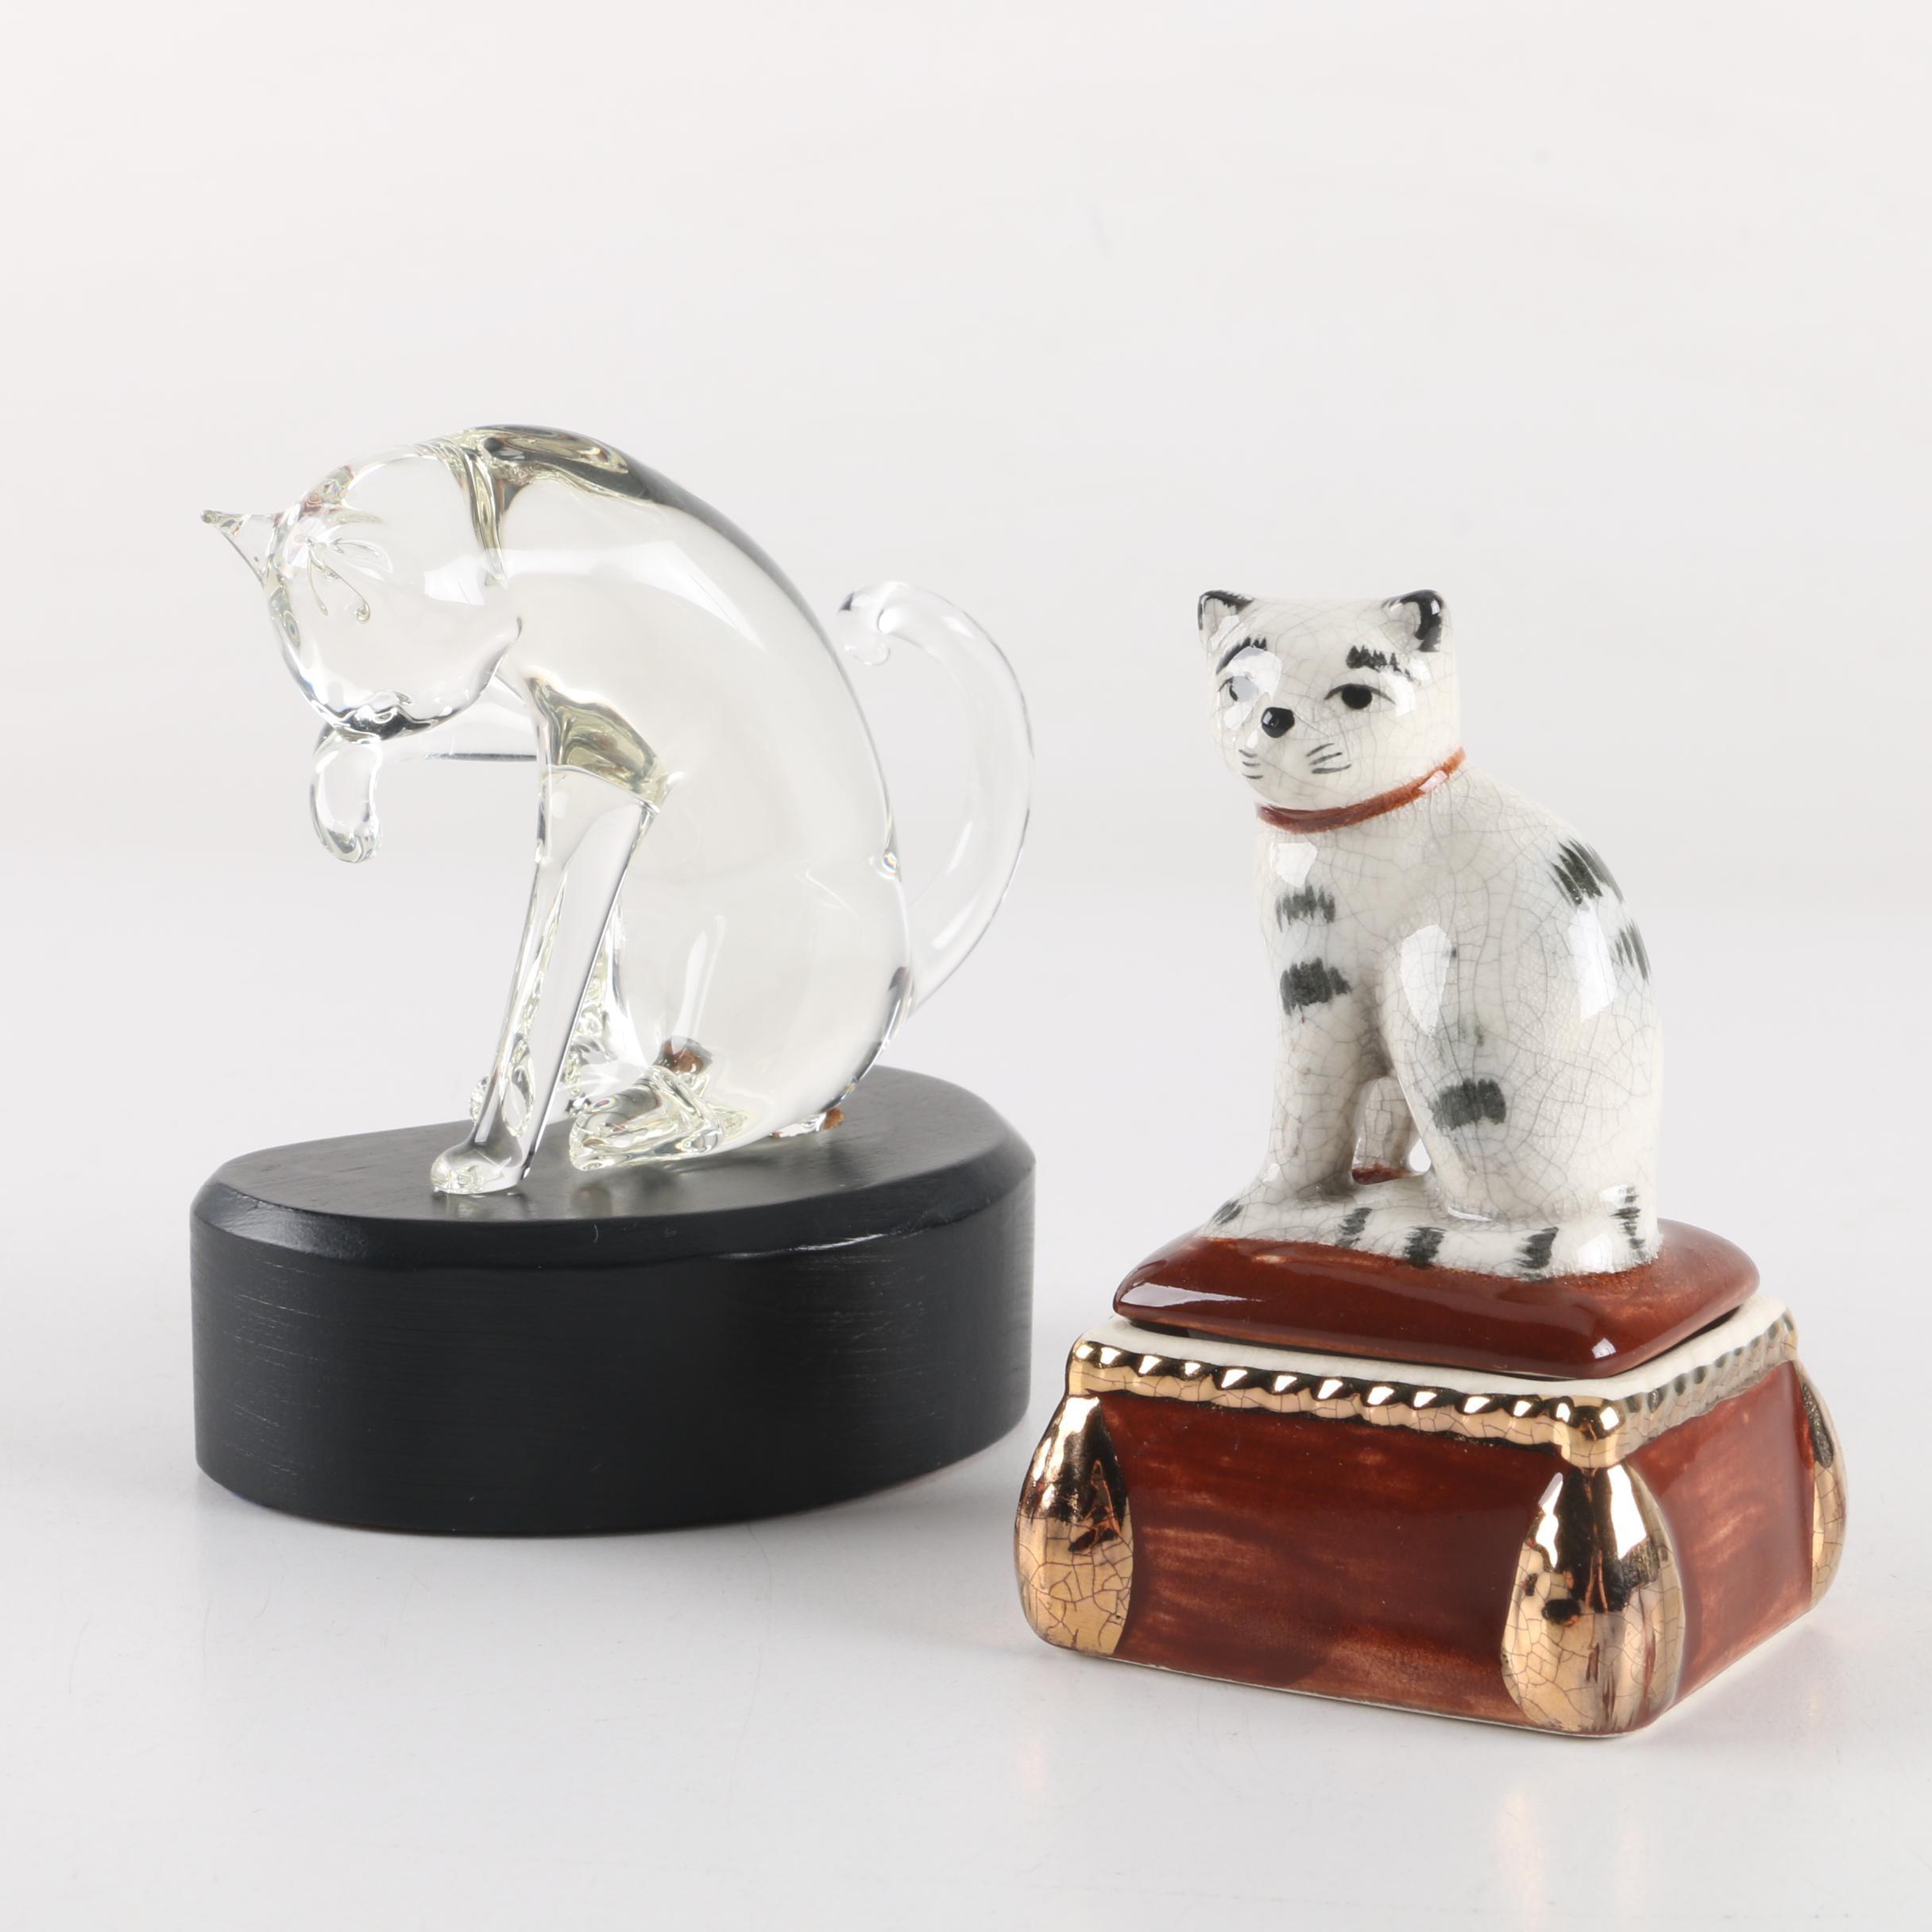 Ceramic and Glass Cat Figurines